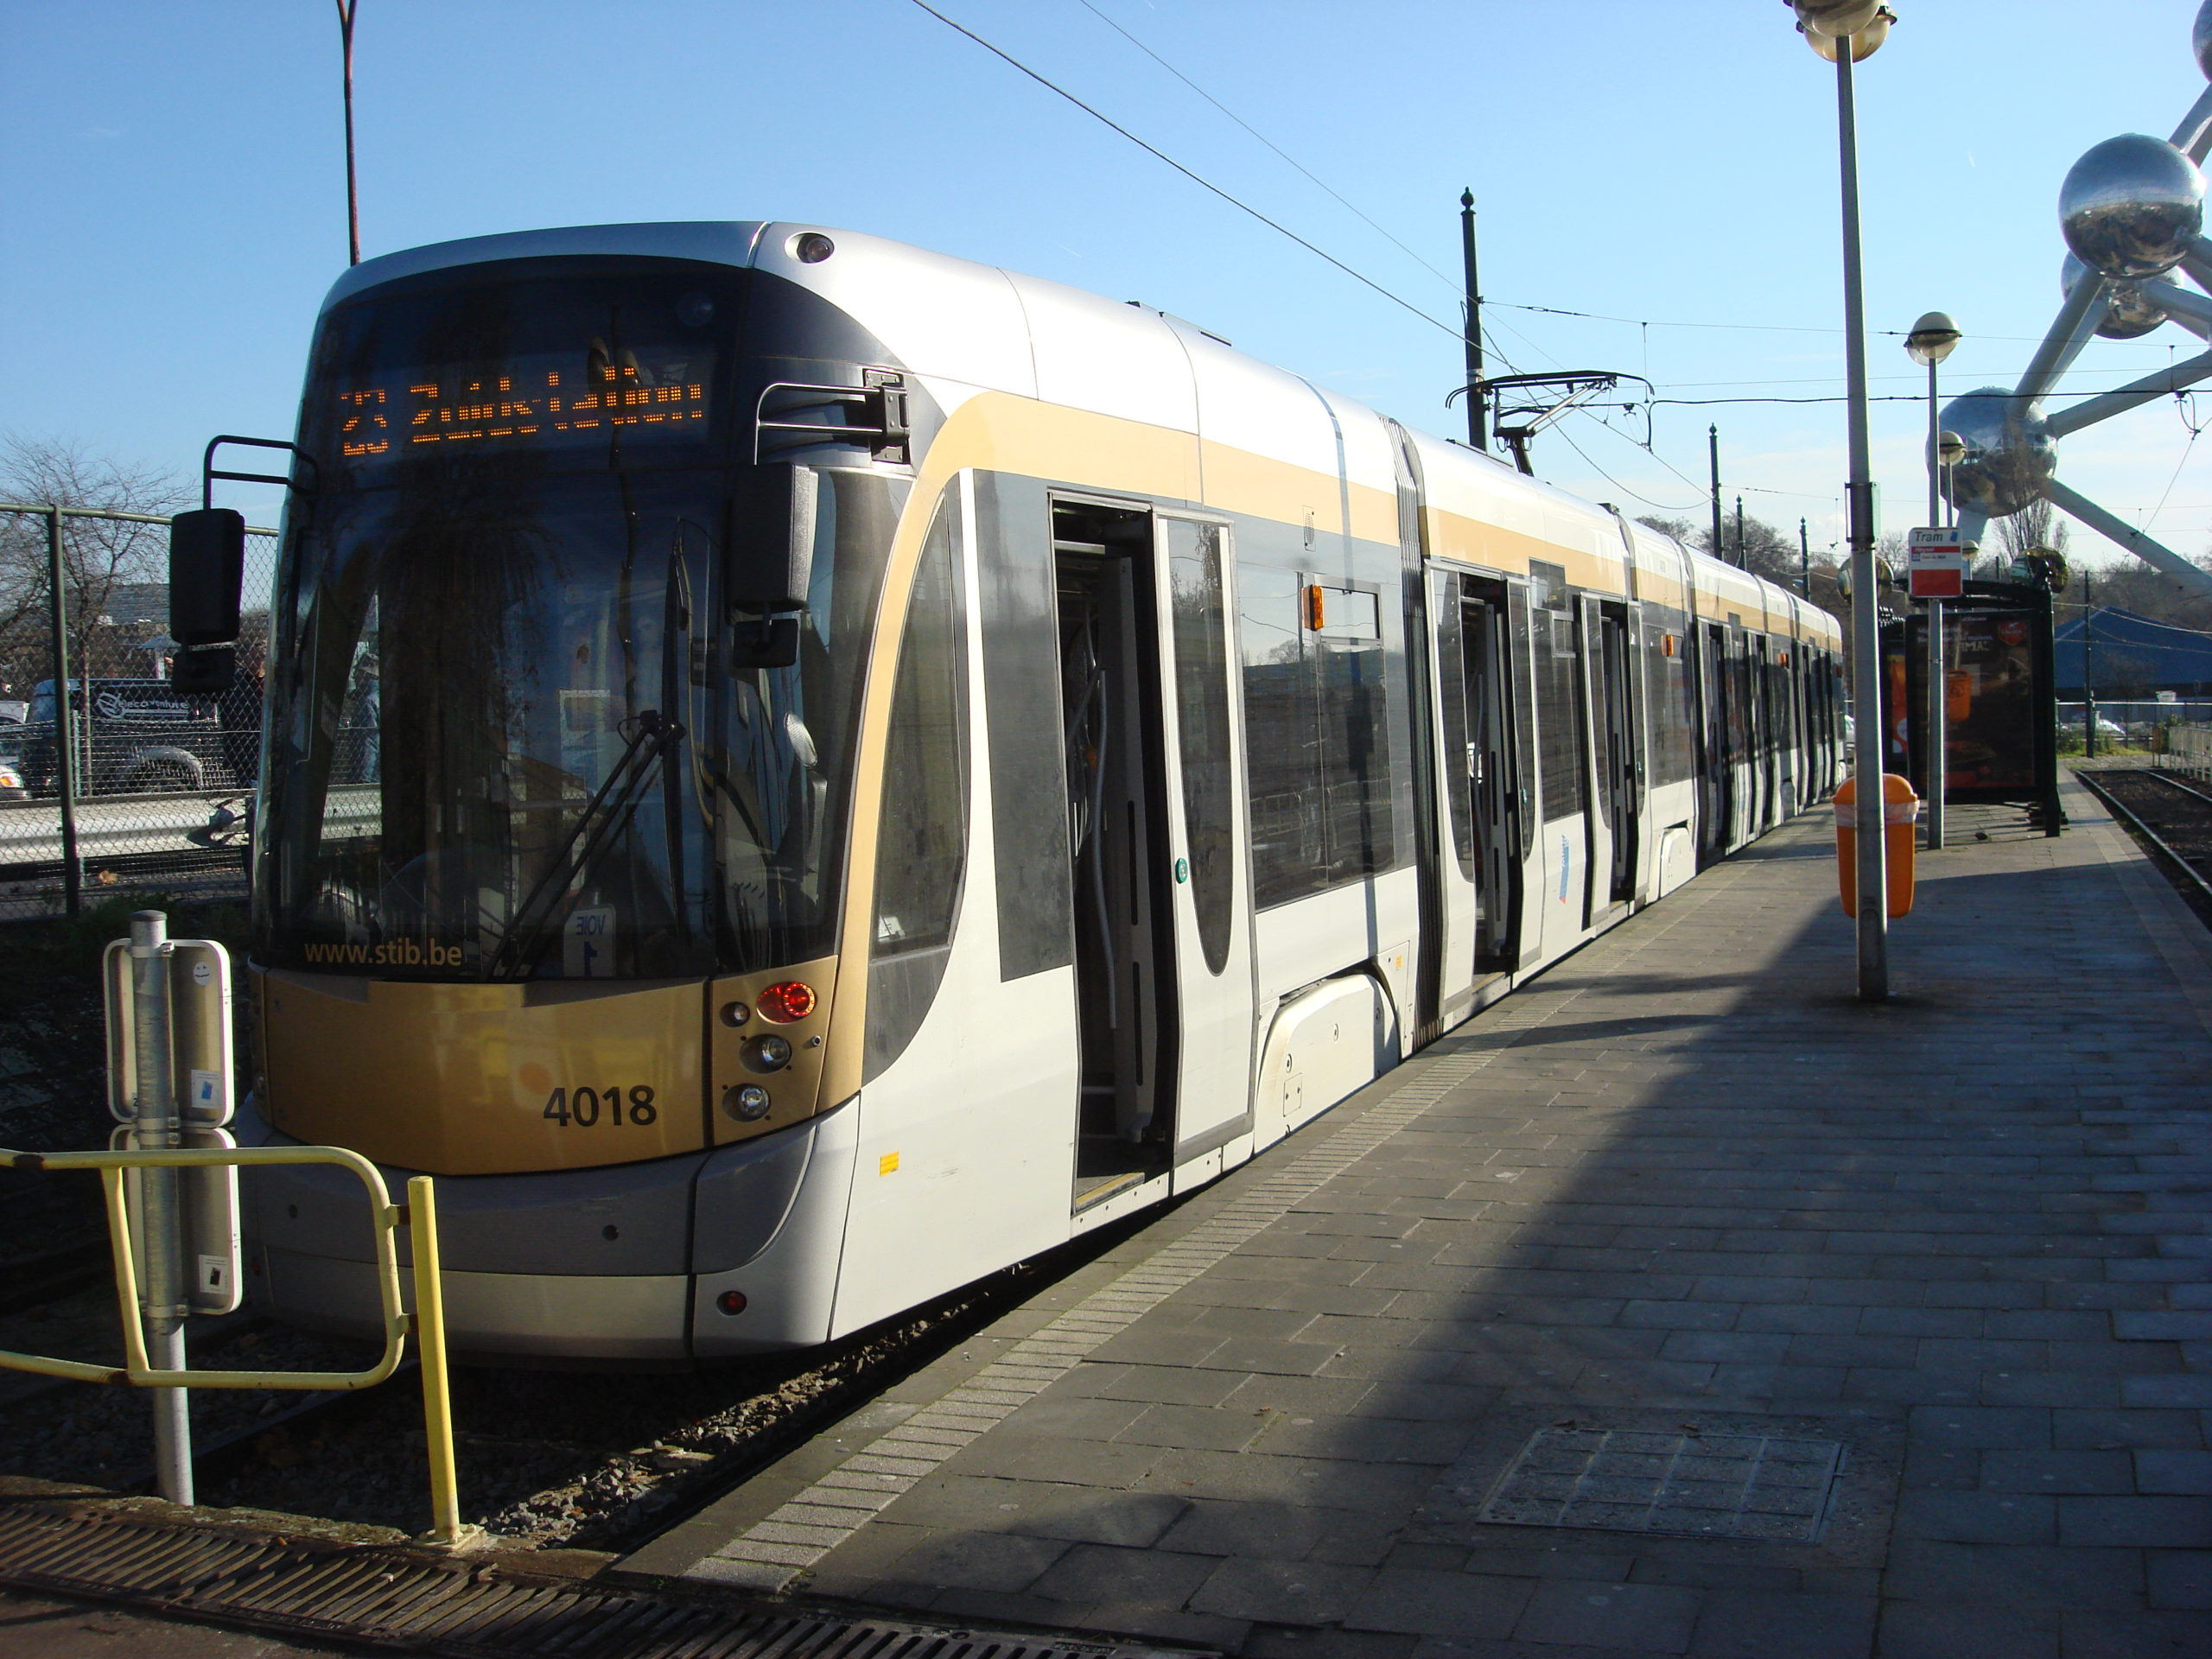 Le projet de tram 10 vers Neder-Over-Heembeek, qu'en est-il?